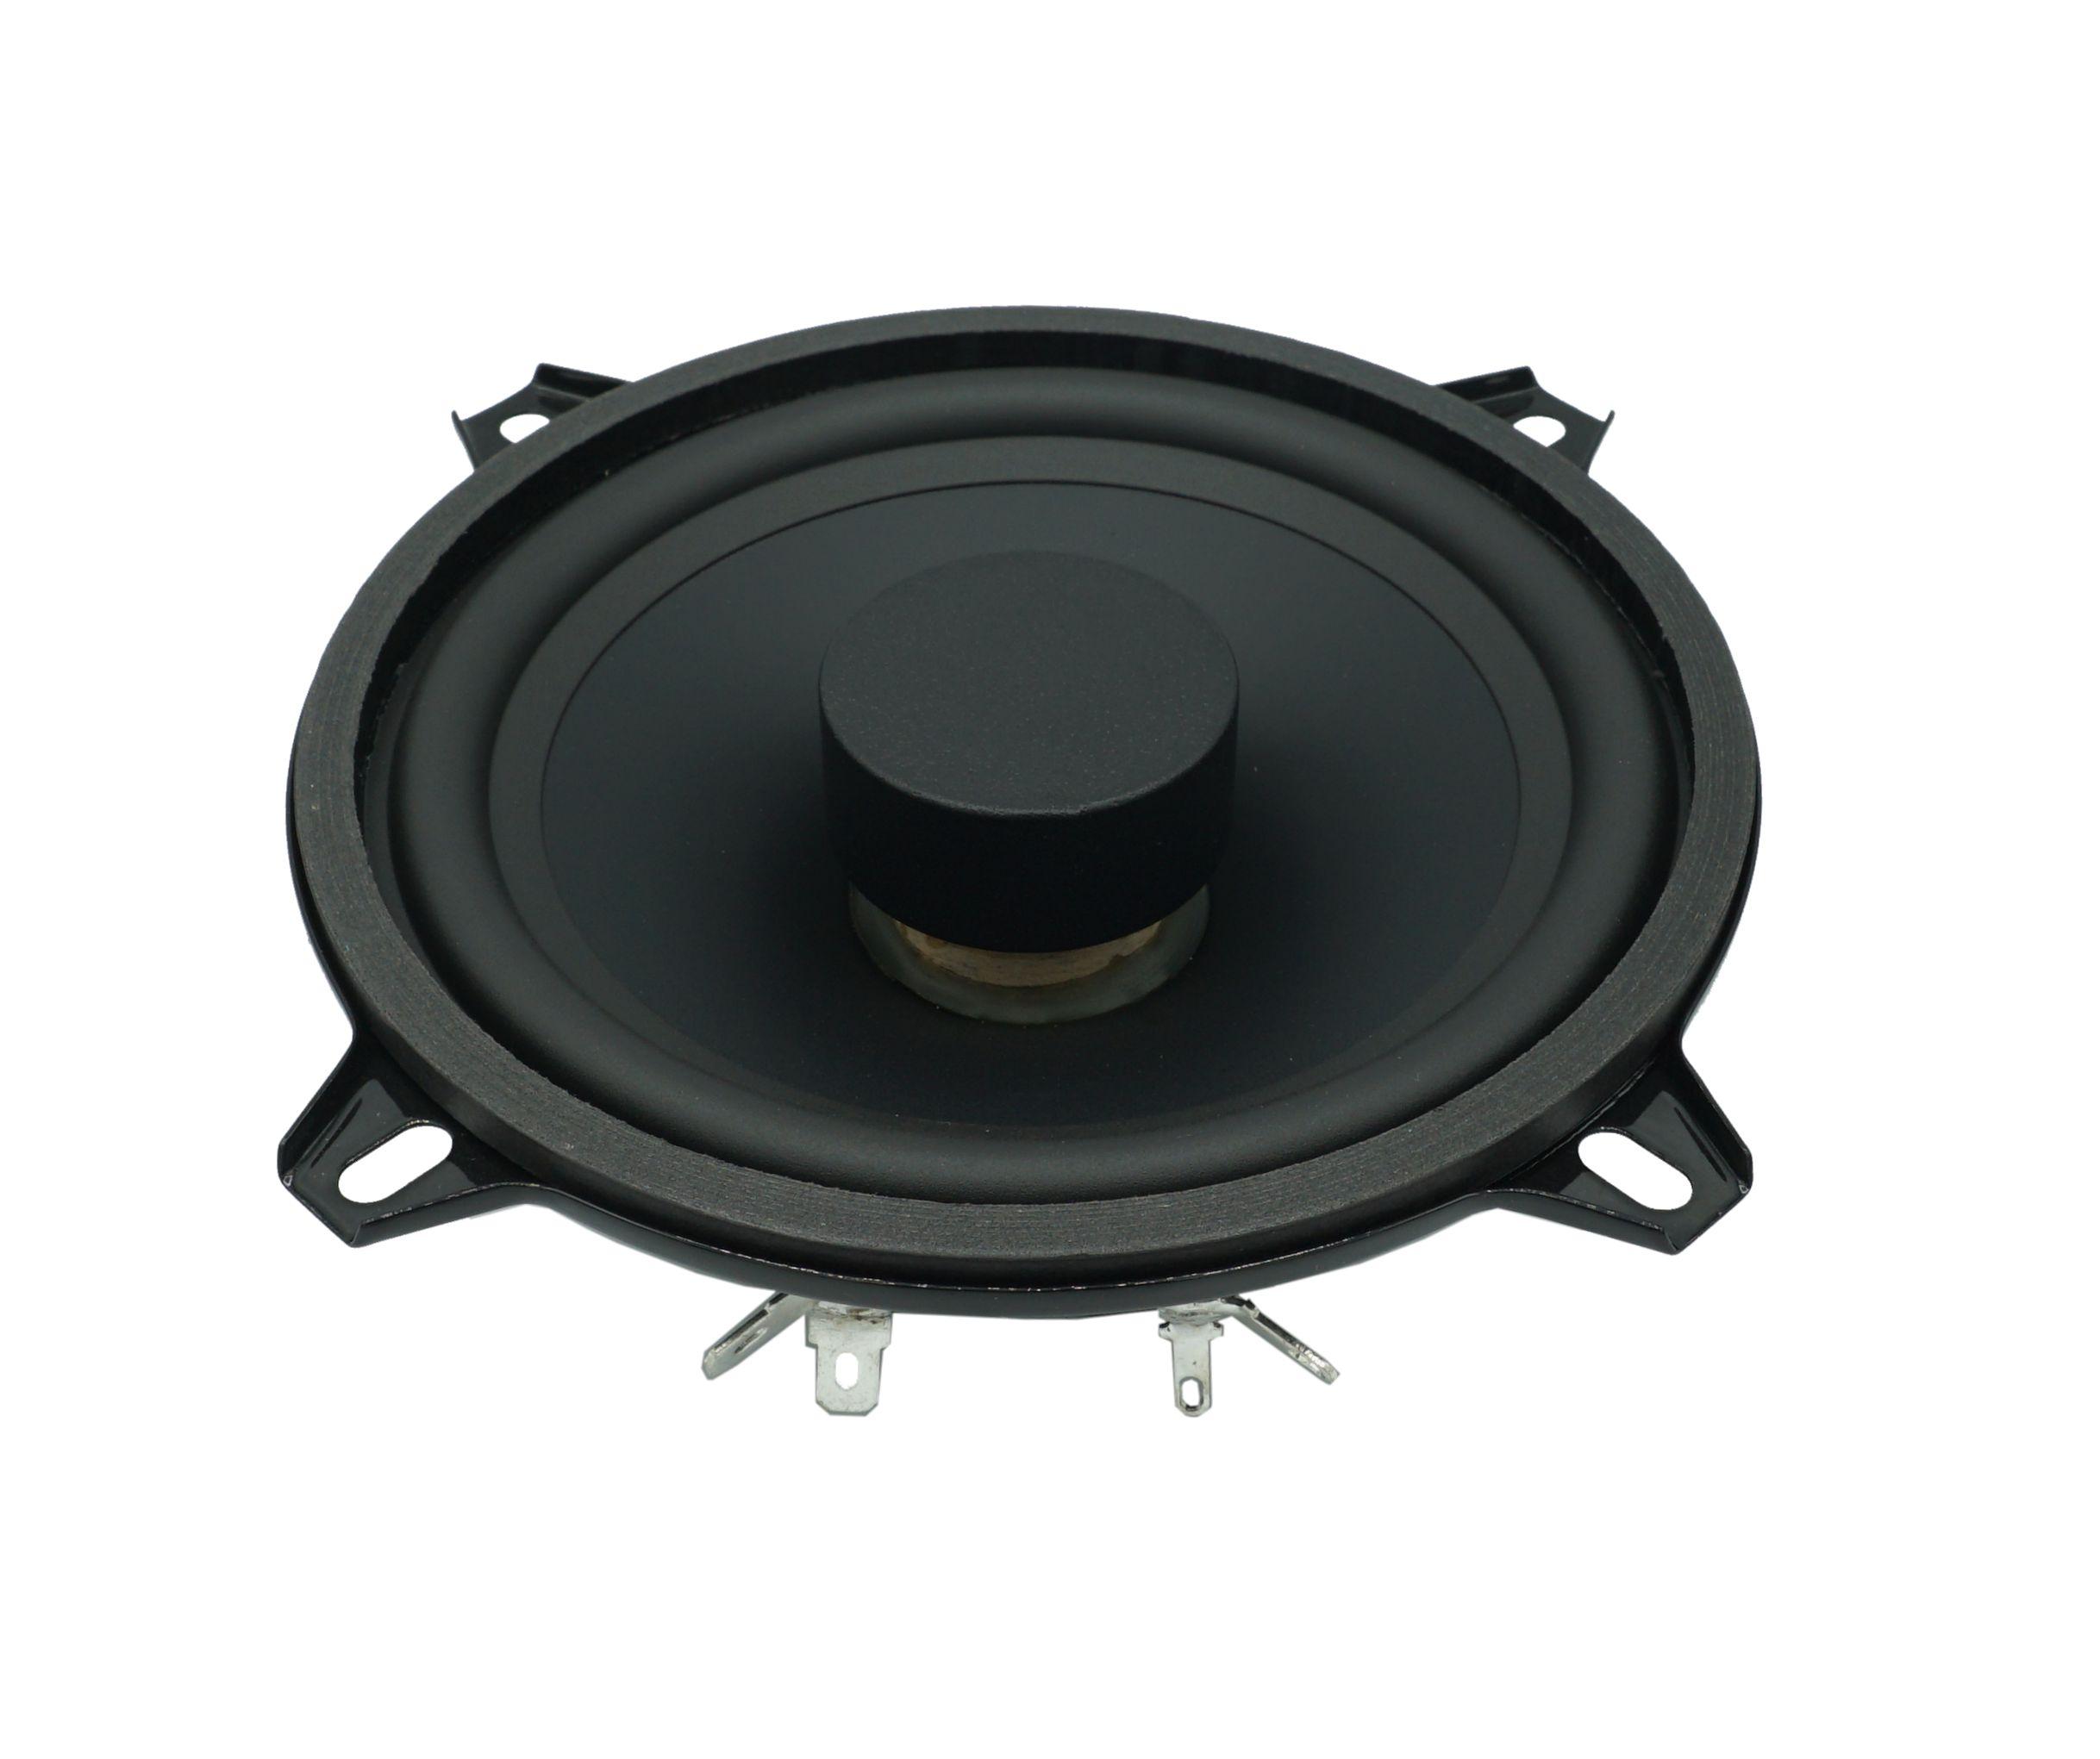 Audio System AS 130 FLAT EVO2 flache Tief / Mitteltöner 240 Watt - 1 Paar